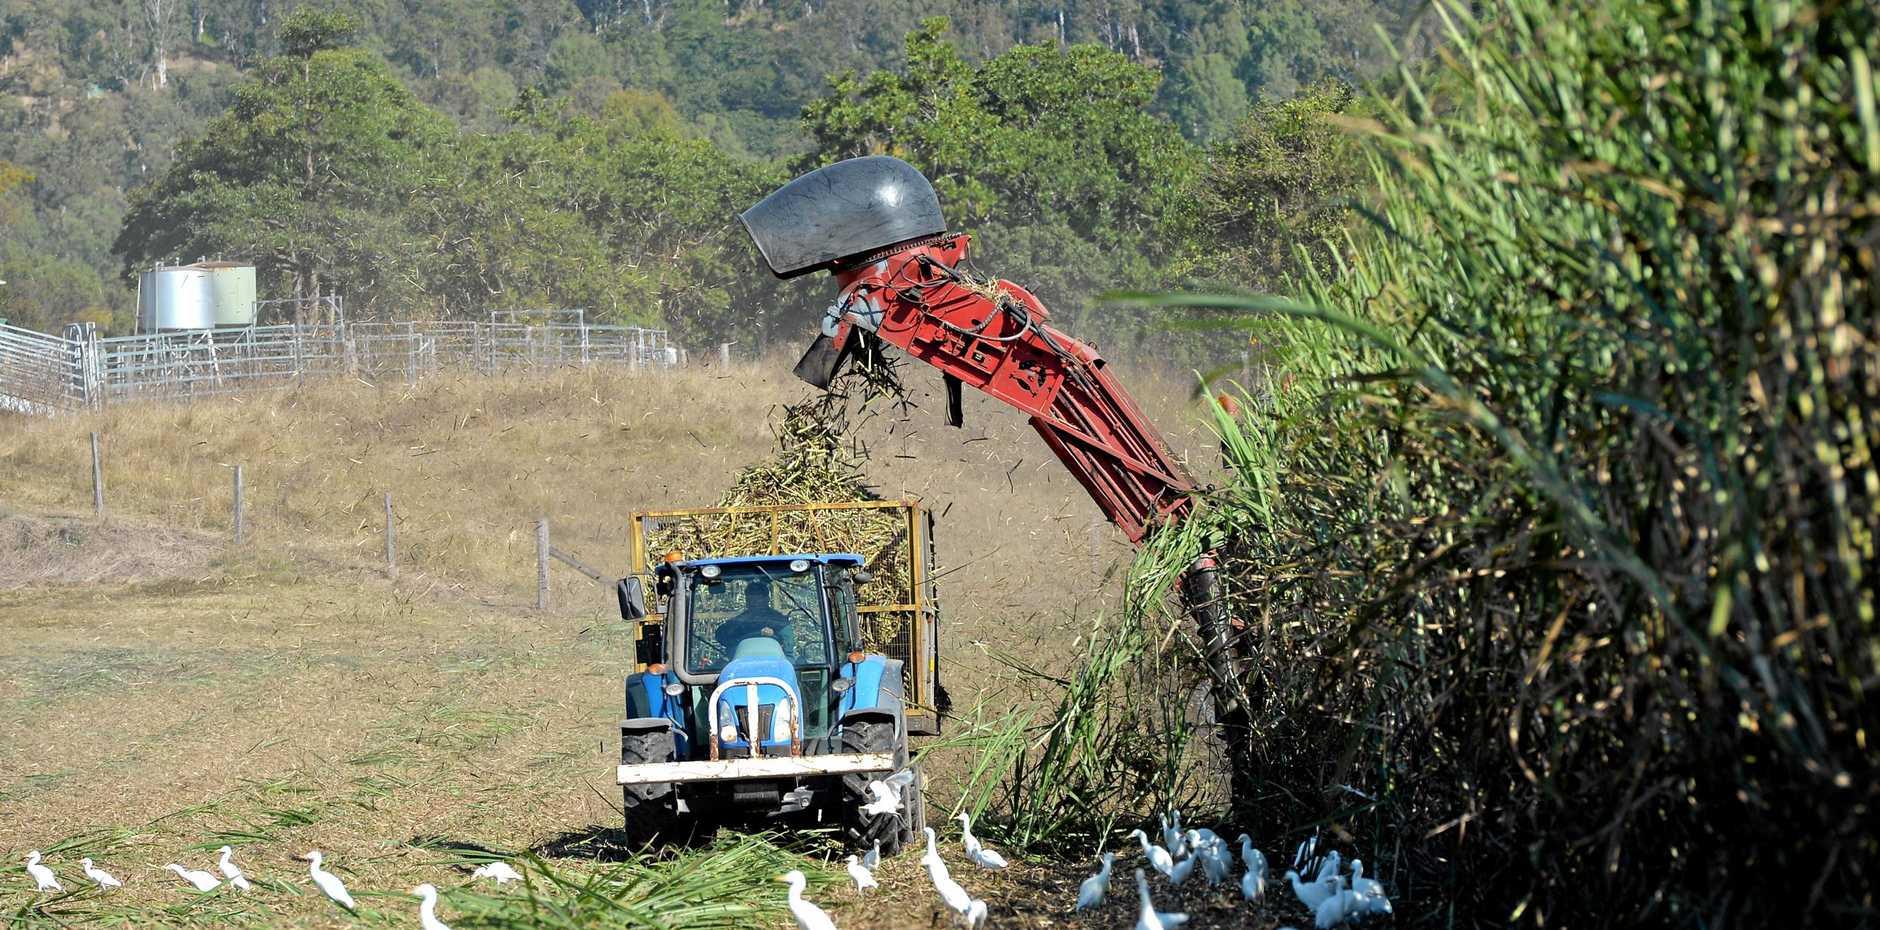 Cane harvesting along the Mackay-Eungella road near Pinaccle